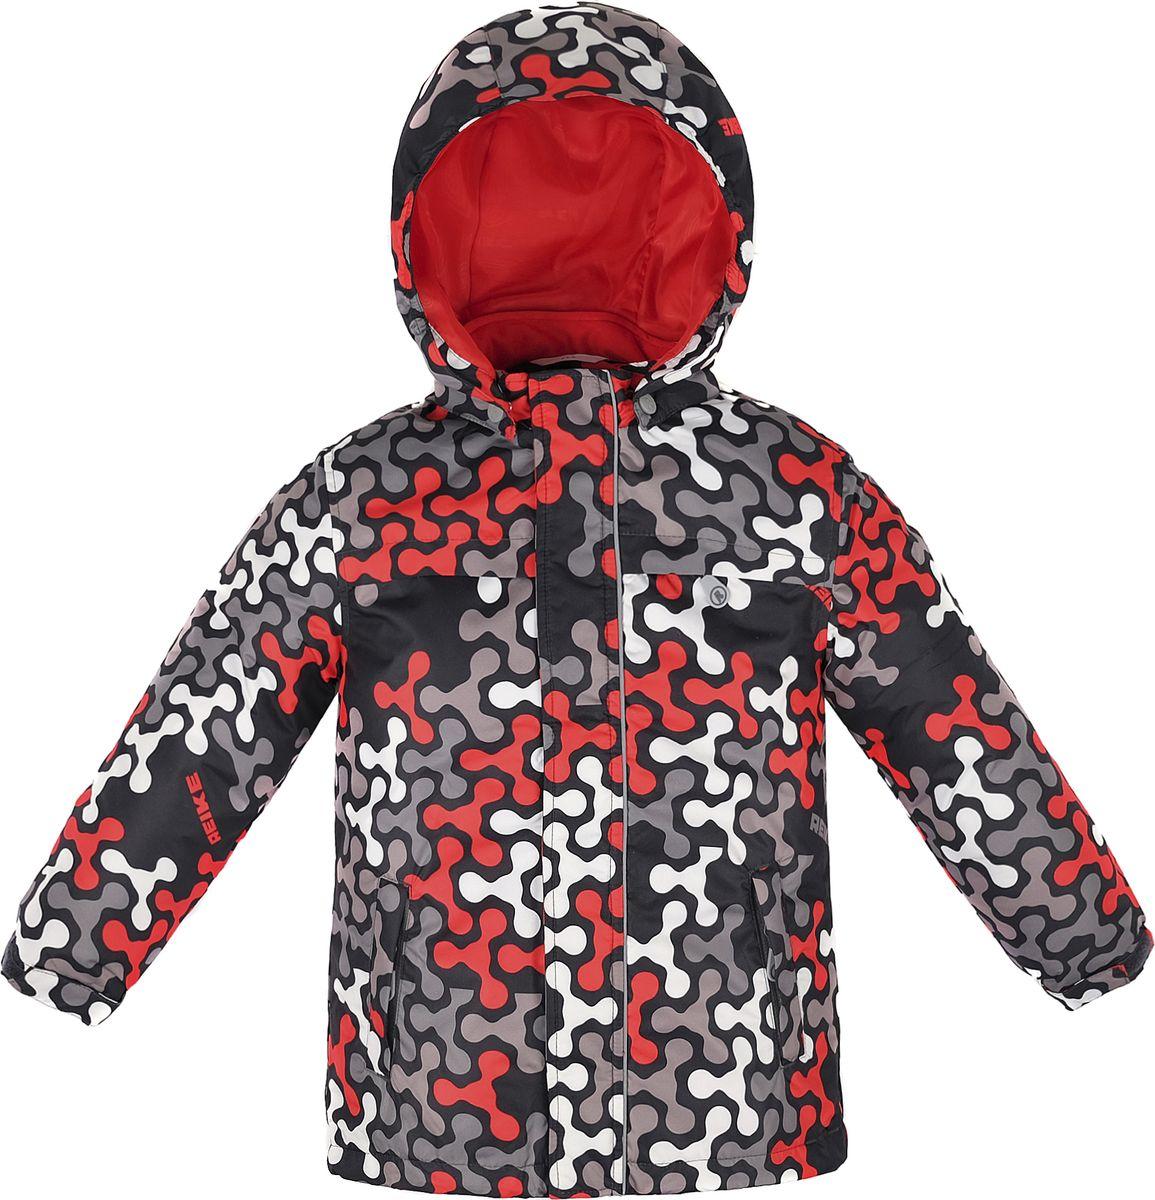 Куртка для мальчика Reike, цвет: красный. 40 895 110_SPN(60) red. Размер 122, 7 лет40 895 110_SPN(60) red